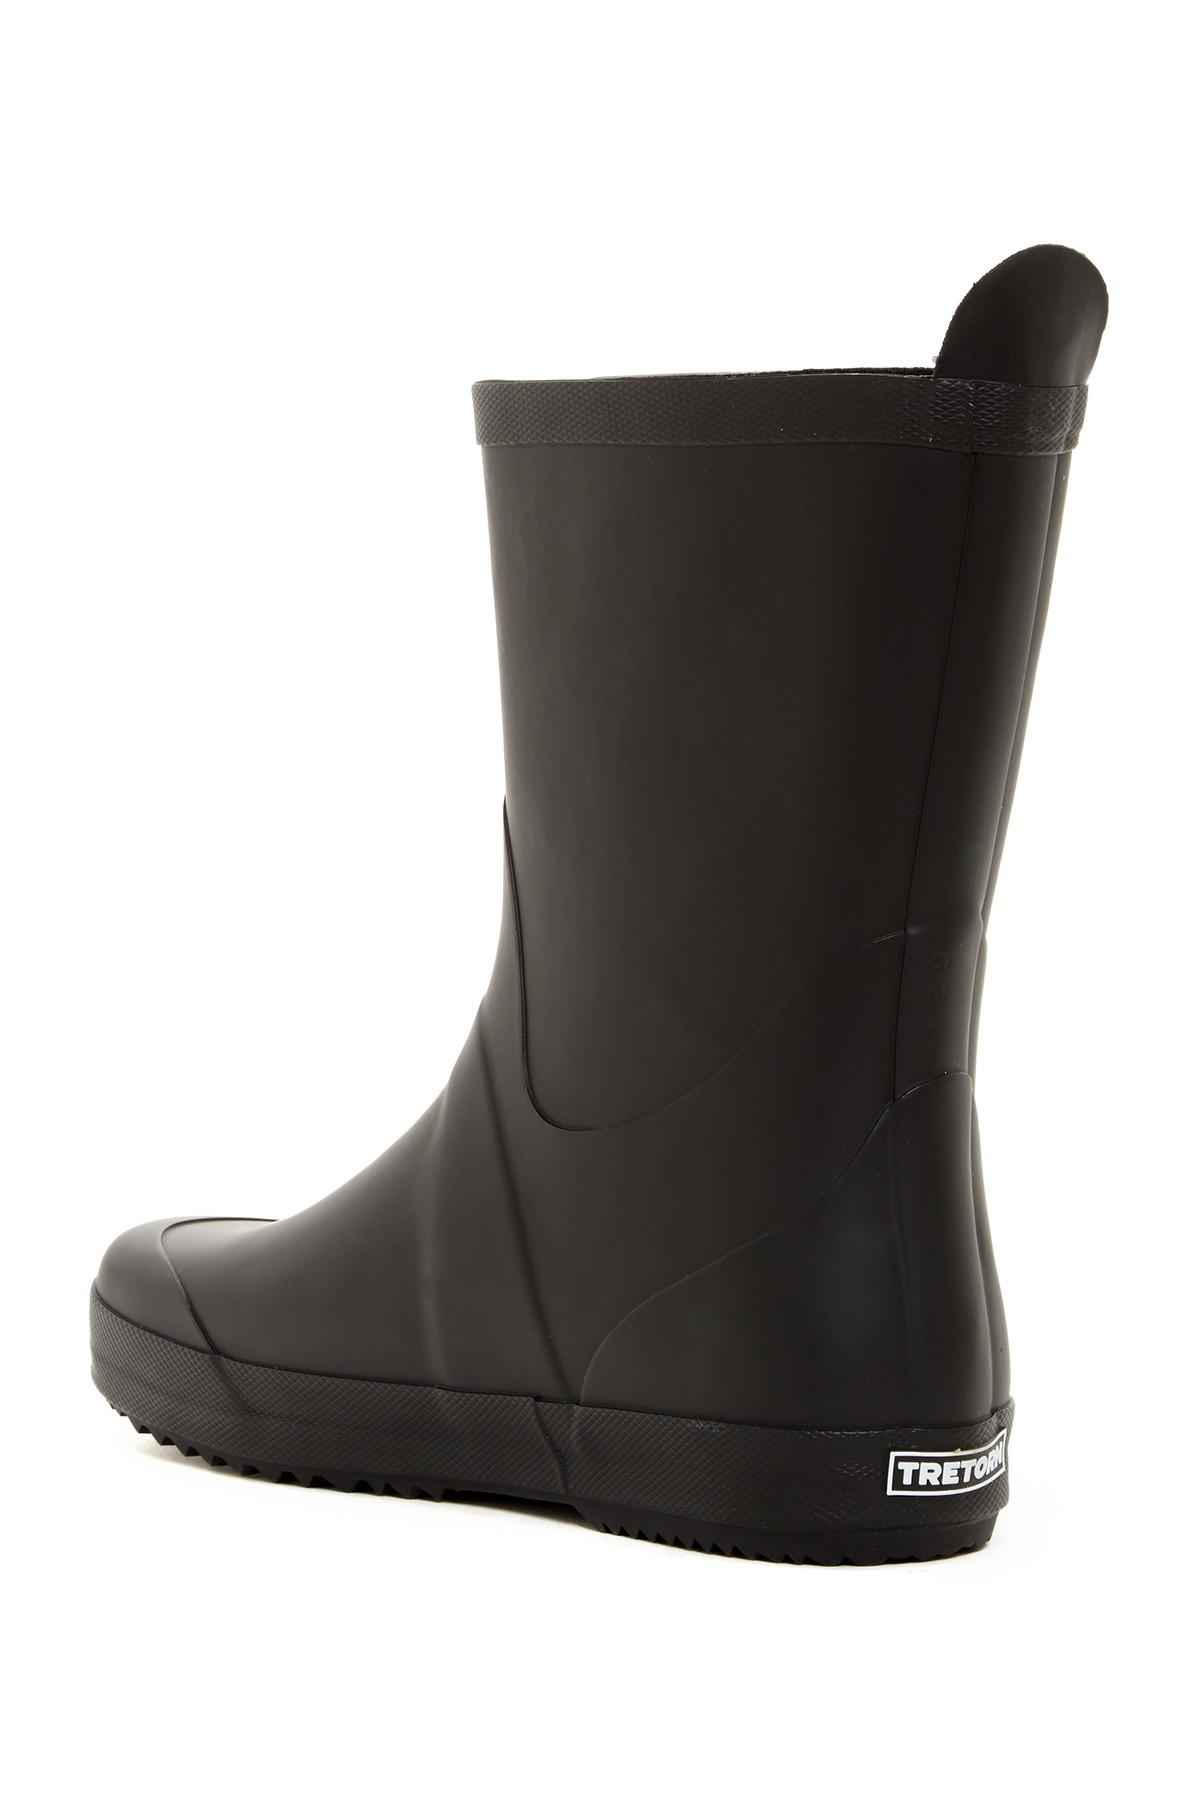 Aldo Leather Shoes Rain Damage